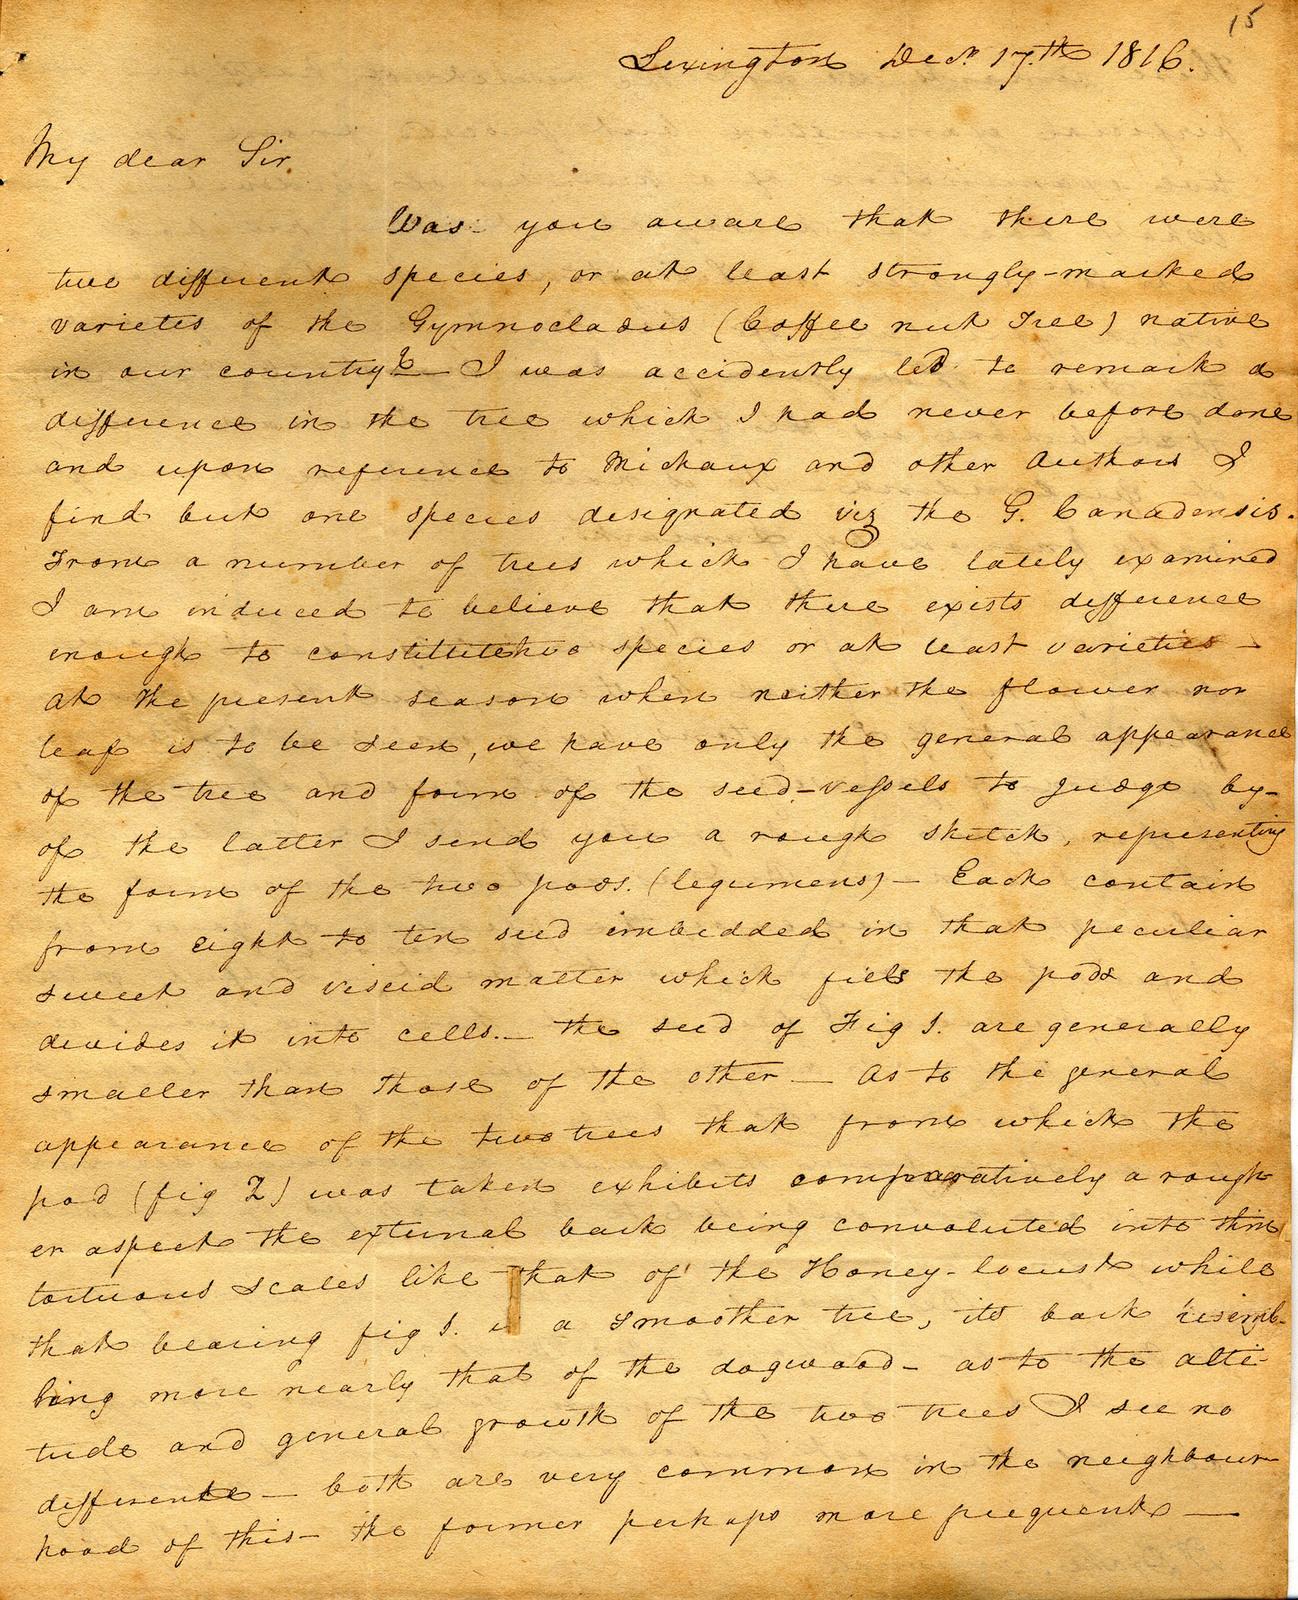 Letter from Charles Wilkins Short to Daniel Drake